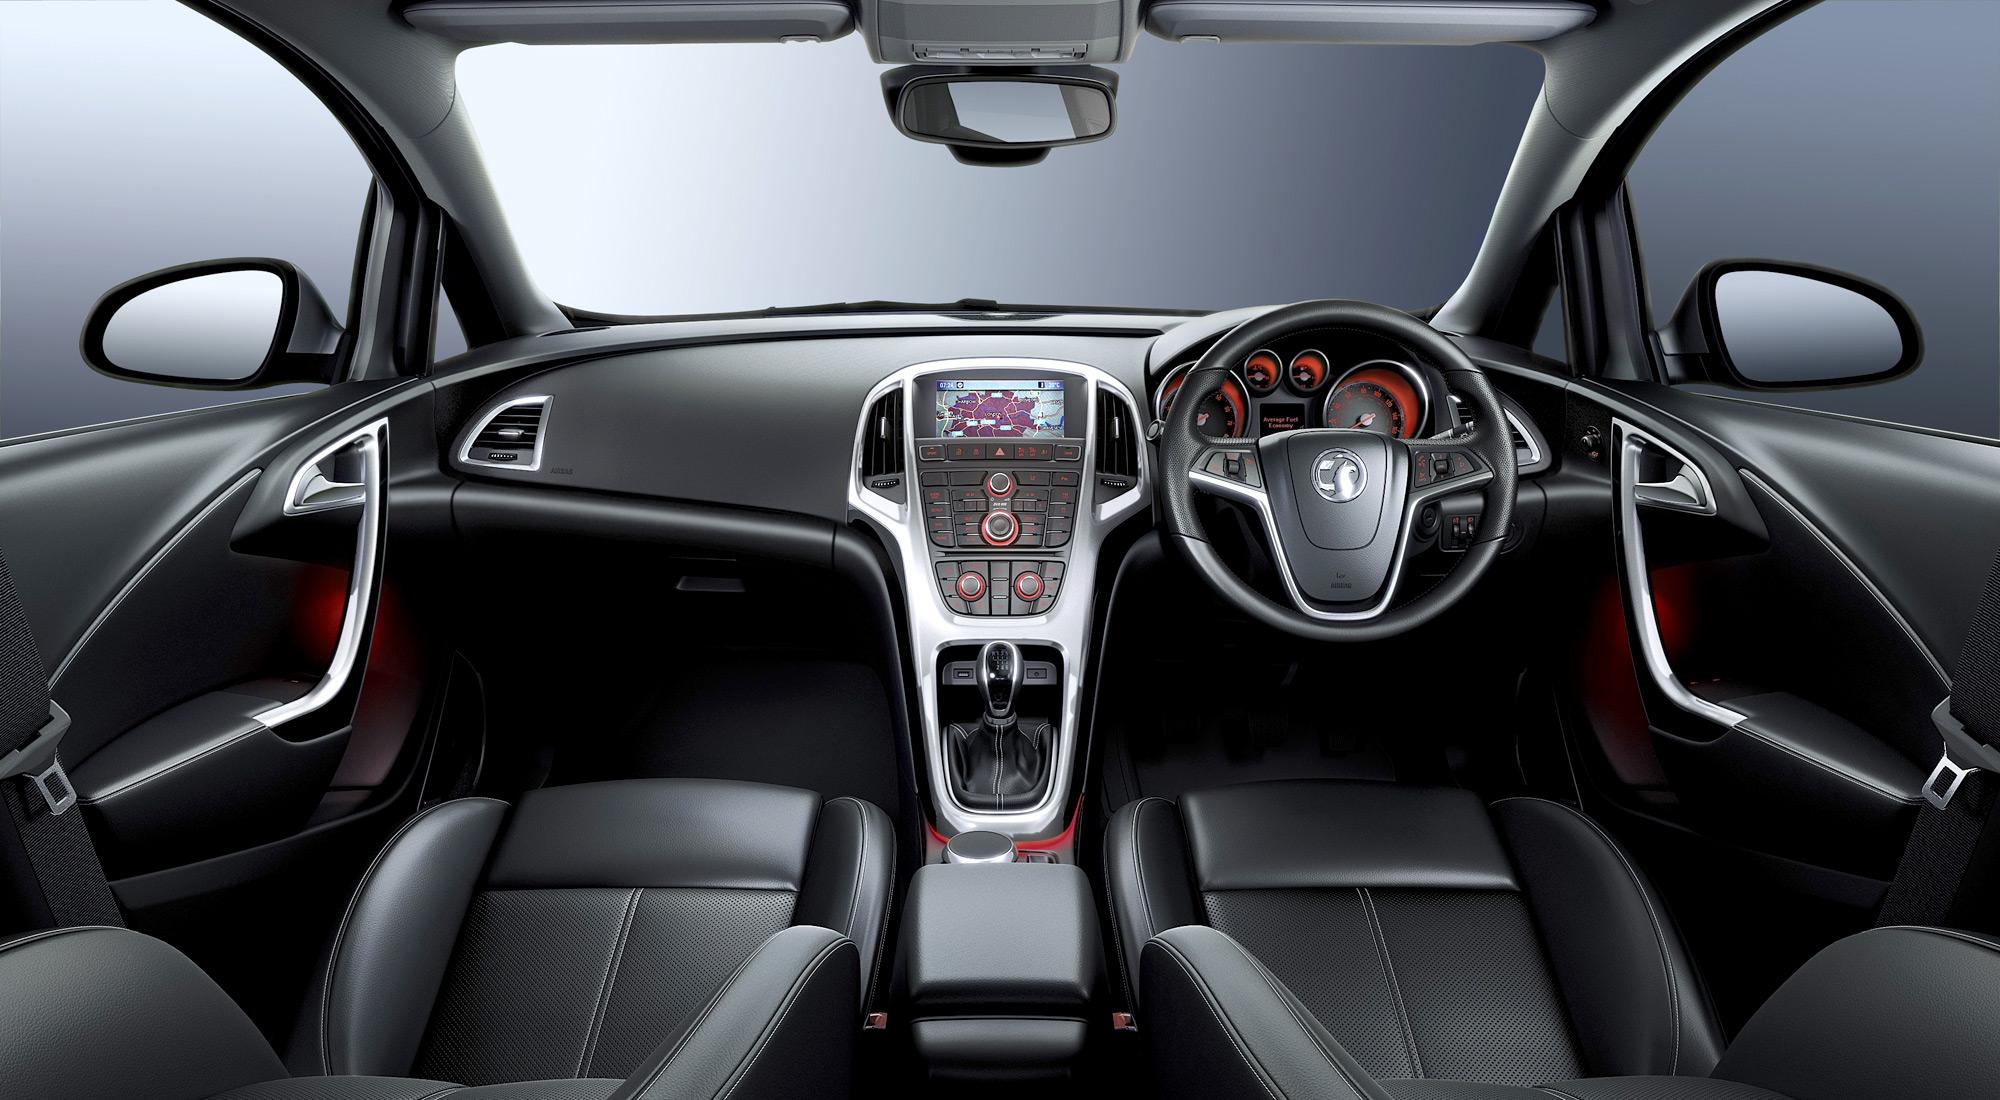 Ausmotive Com 187 Inside Vauxhall S New Astra